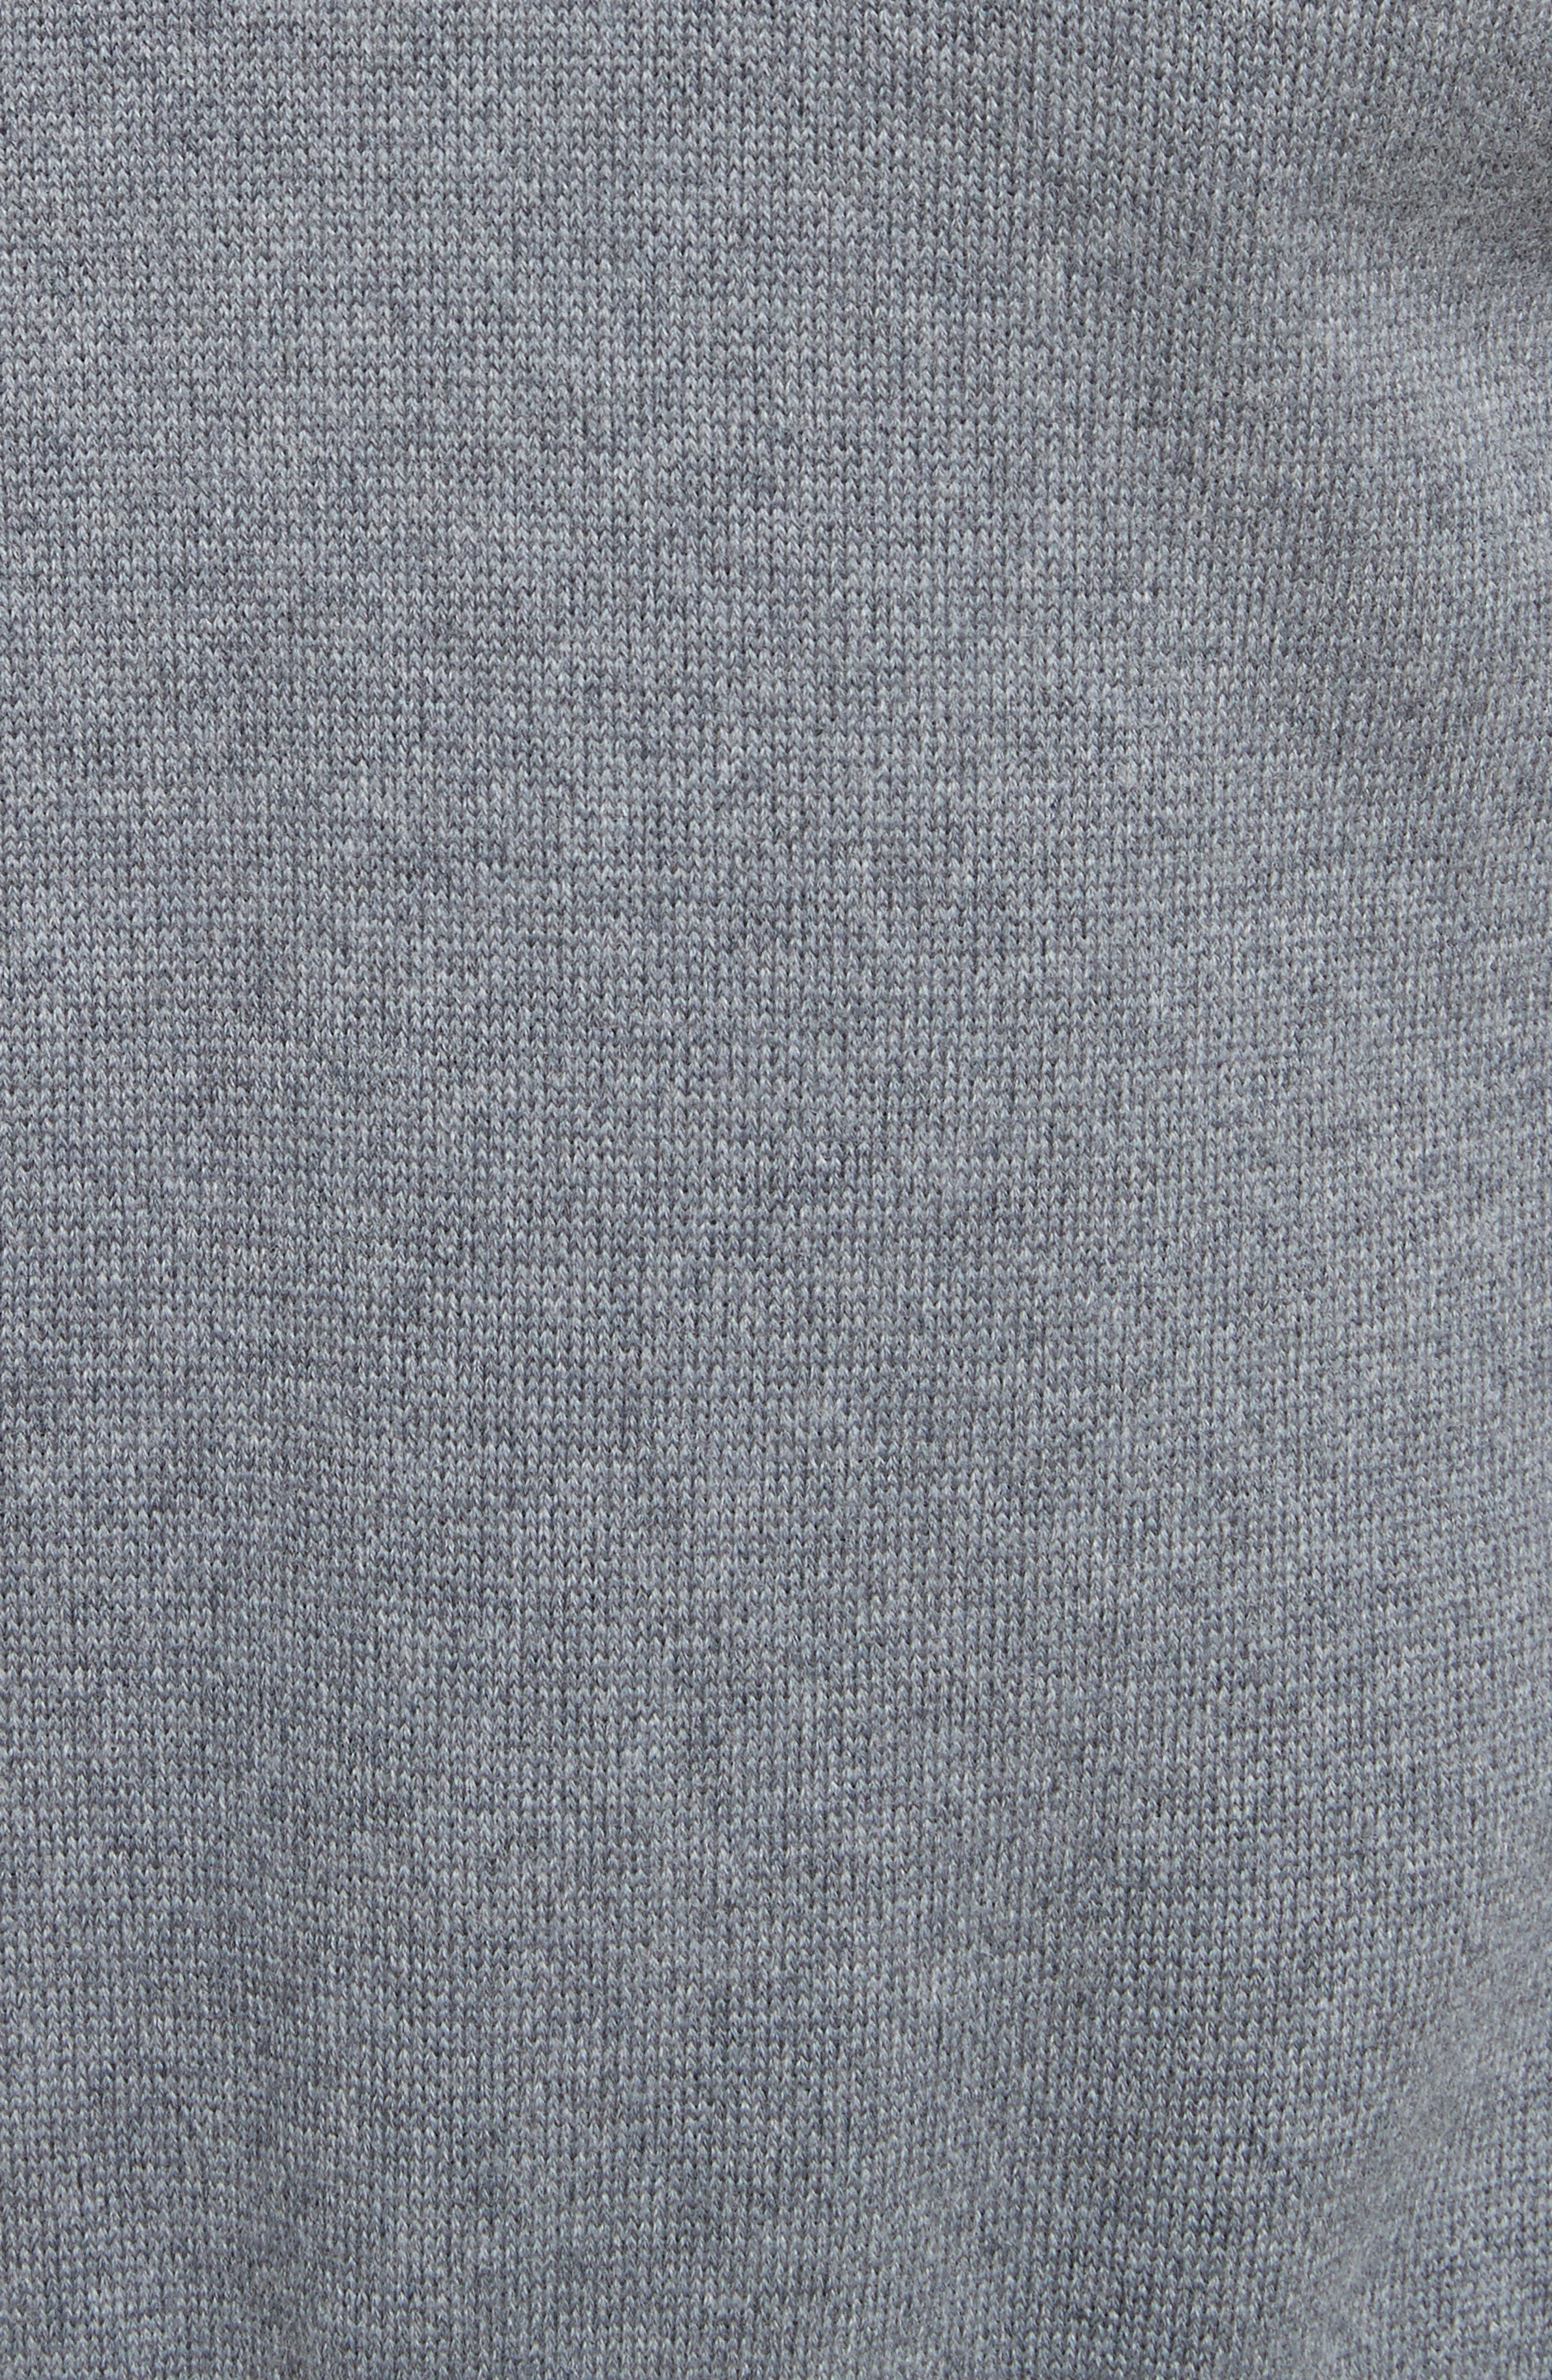 Raglan Merino Wool Sweater,                             Alternate thumbnail 5, color,                             020